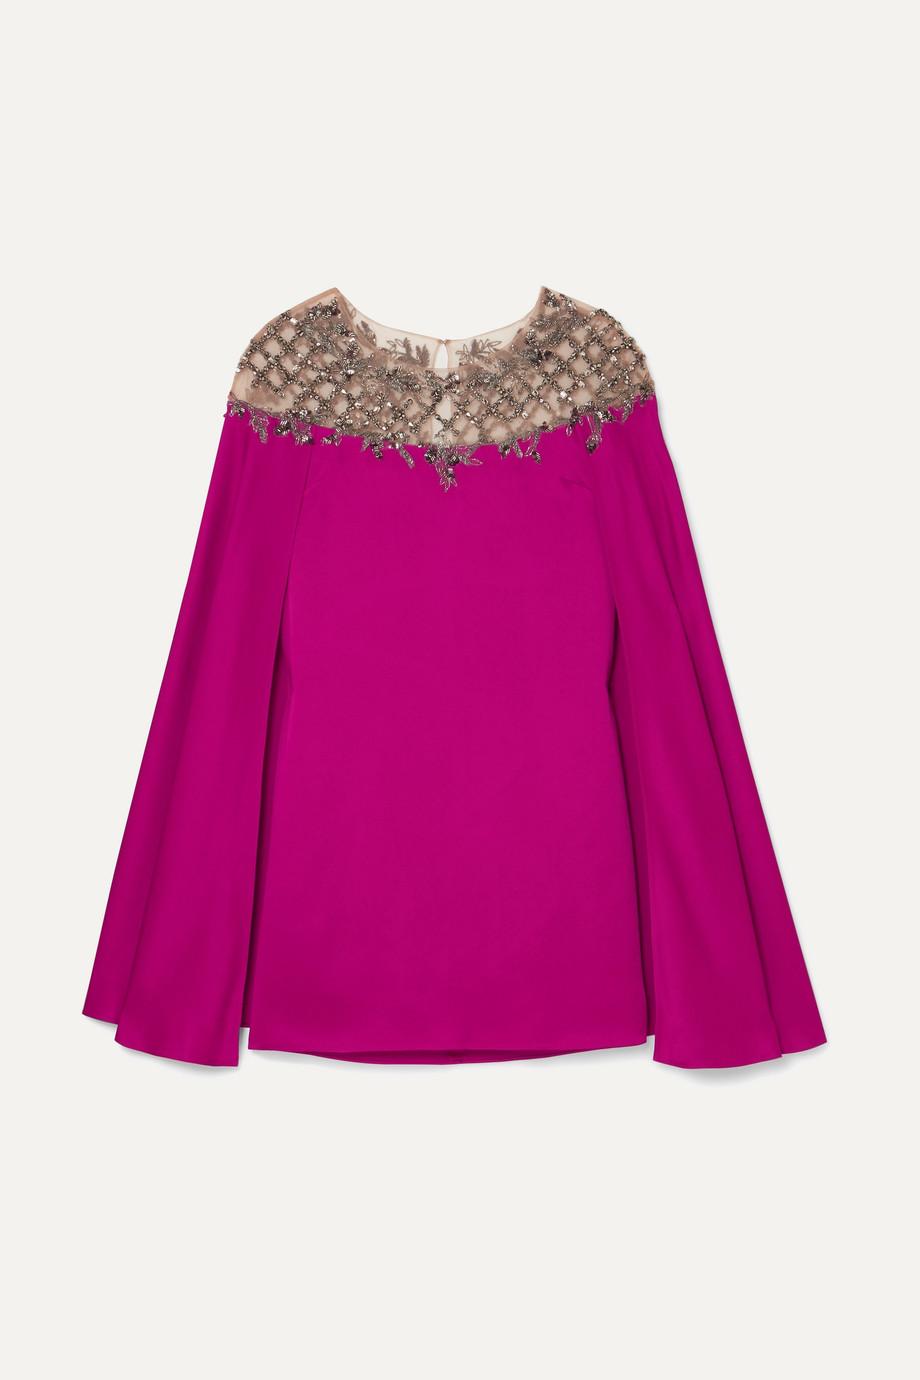 Marchesa | Cape-effect embellished tulle-paneled satin mini dress | NET-A-PORTER.COM